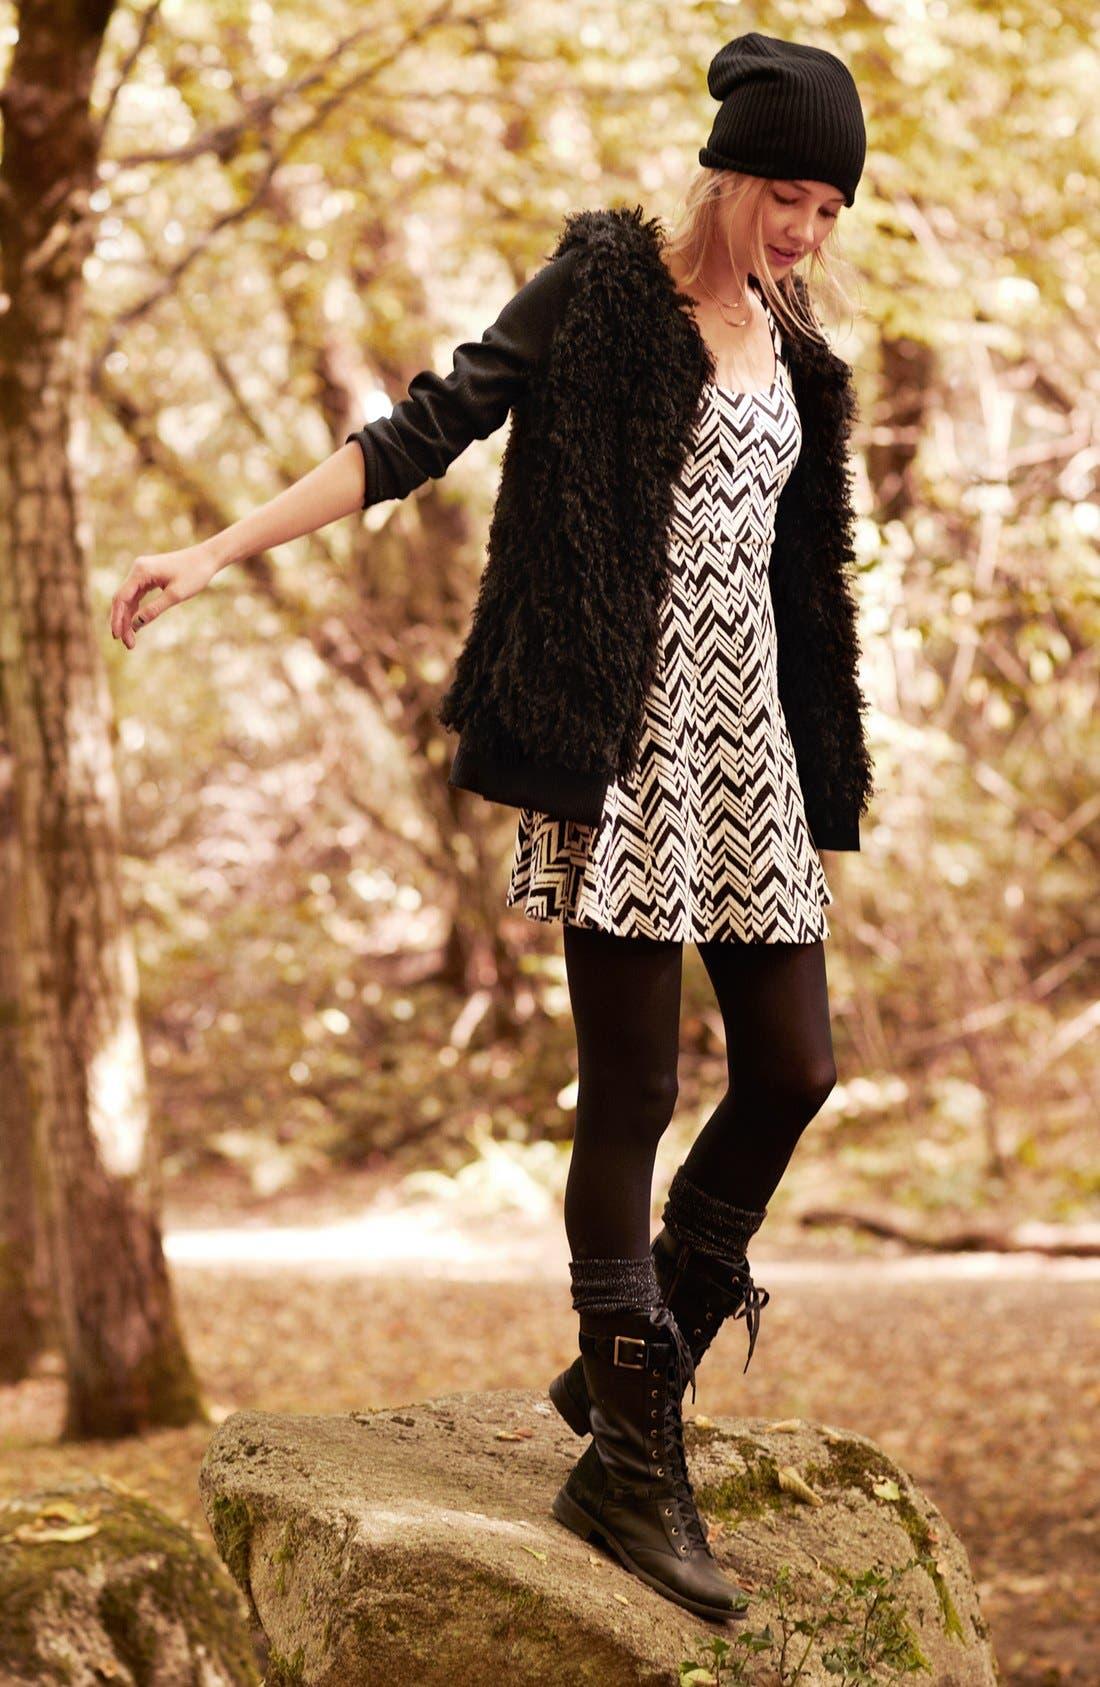 Alternate Image 1 Selected - Tulle Sweater & dee elle Dress